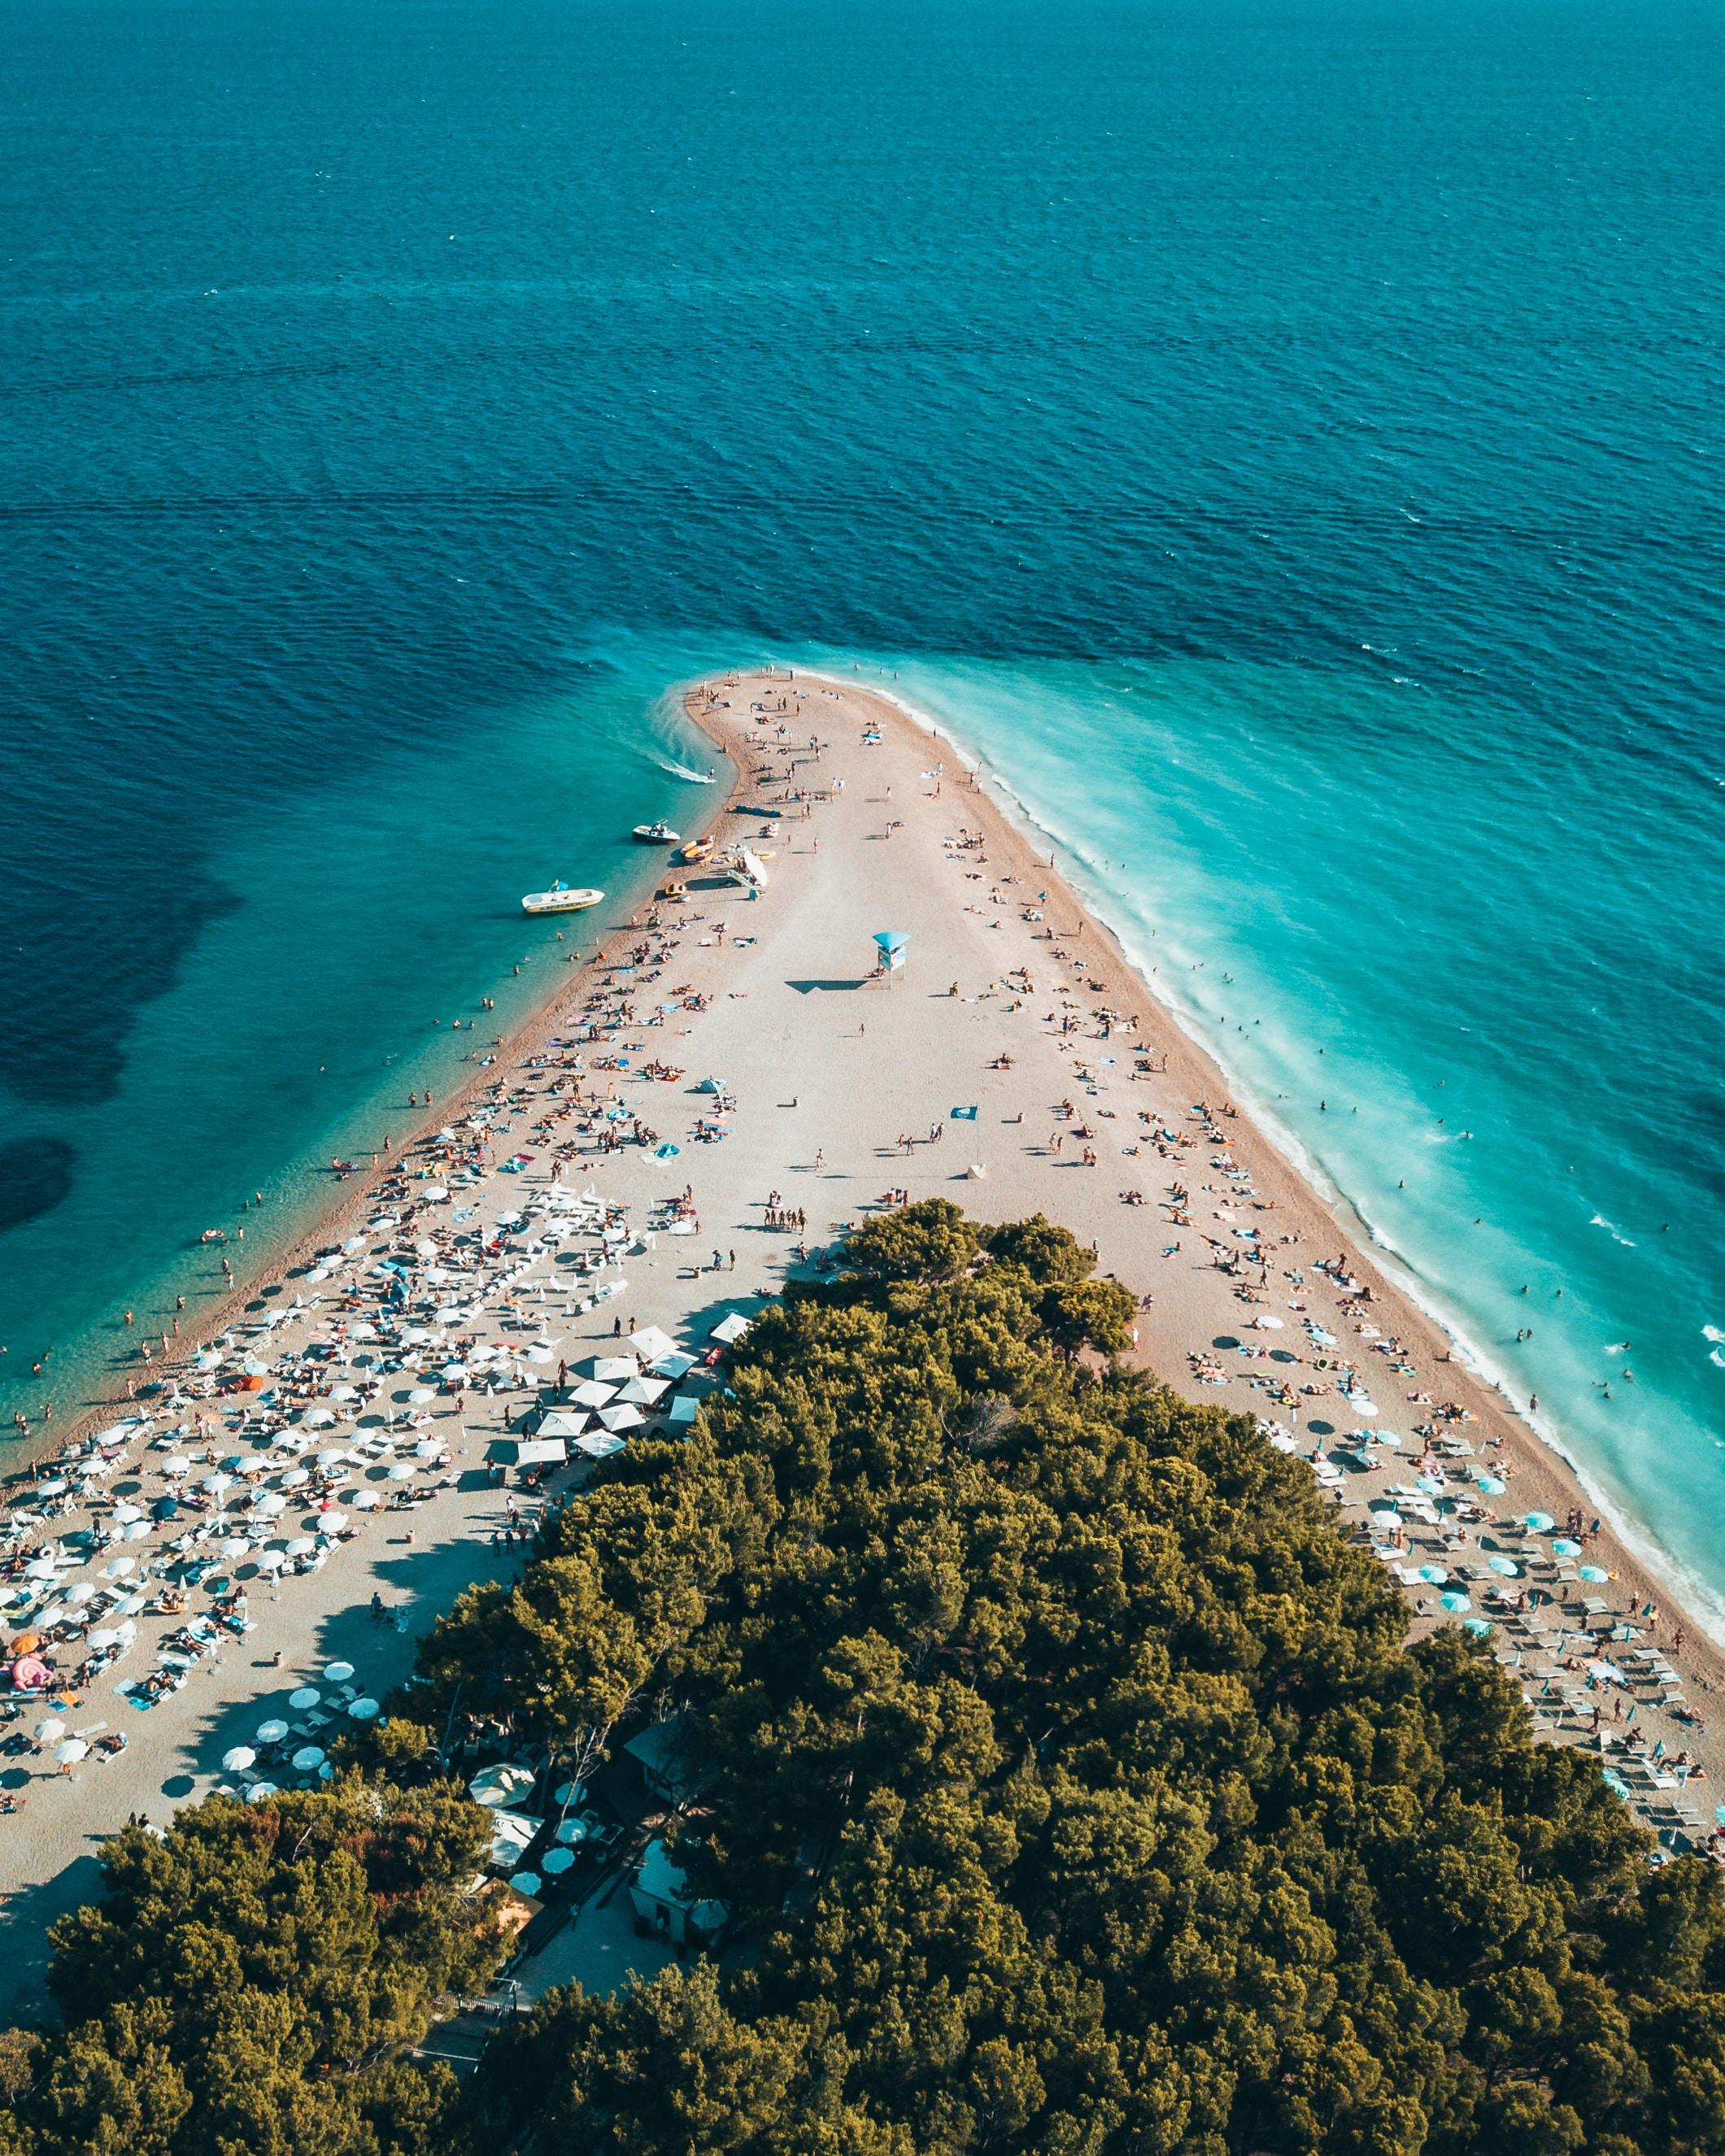 high-angle photo of island